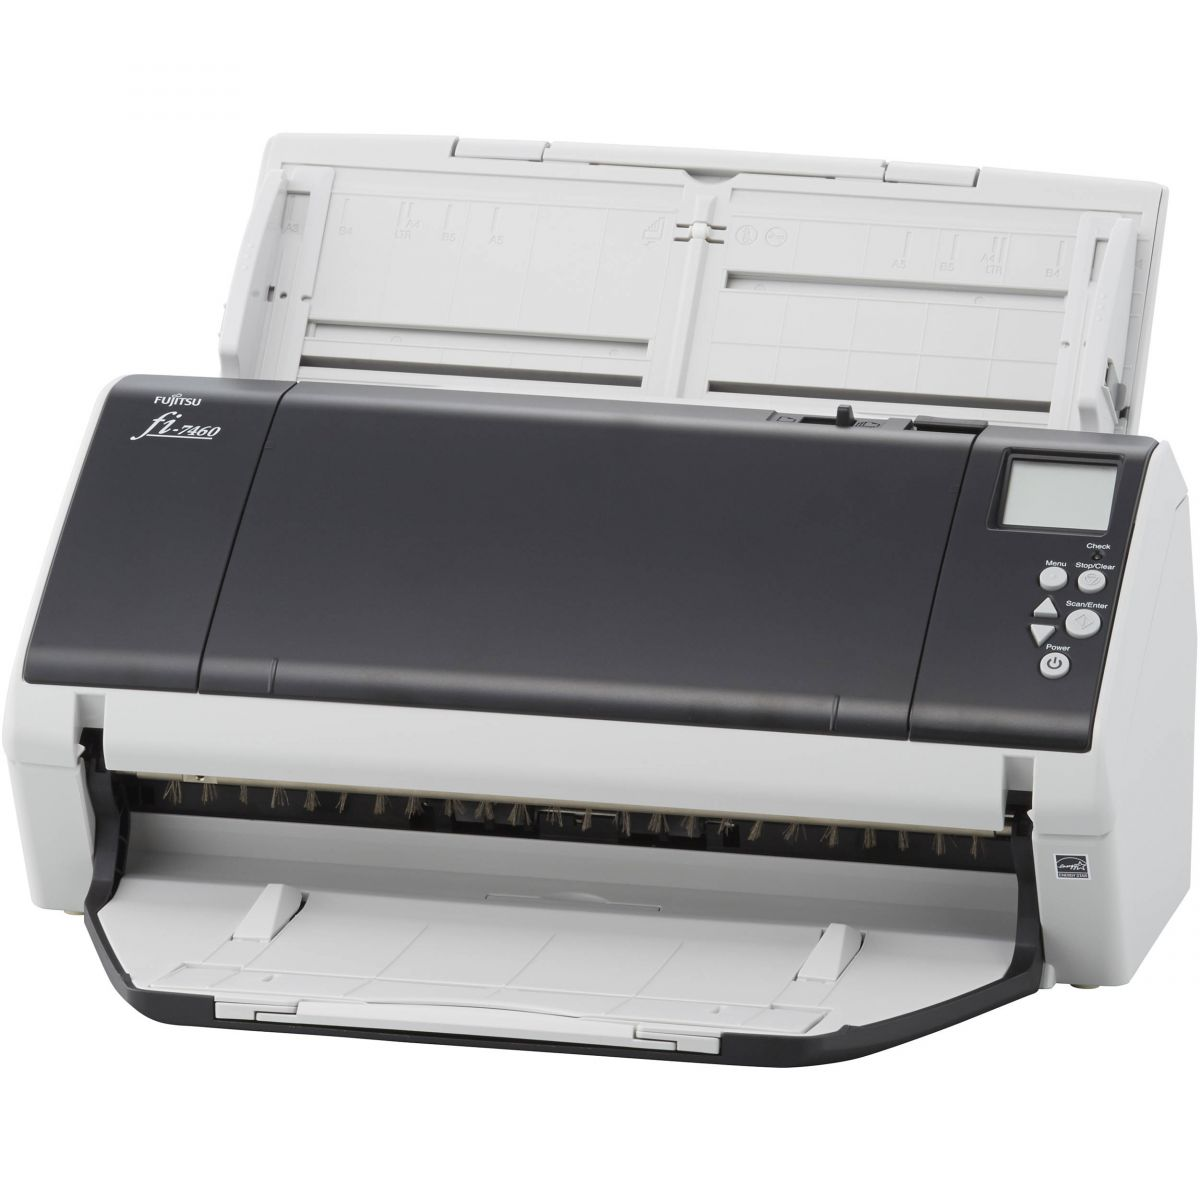 fujitsu-scanner-fi-7460